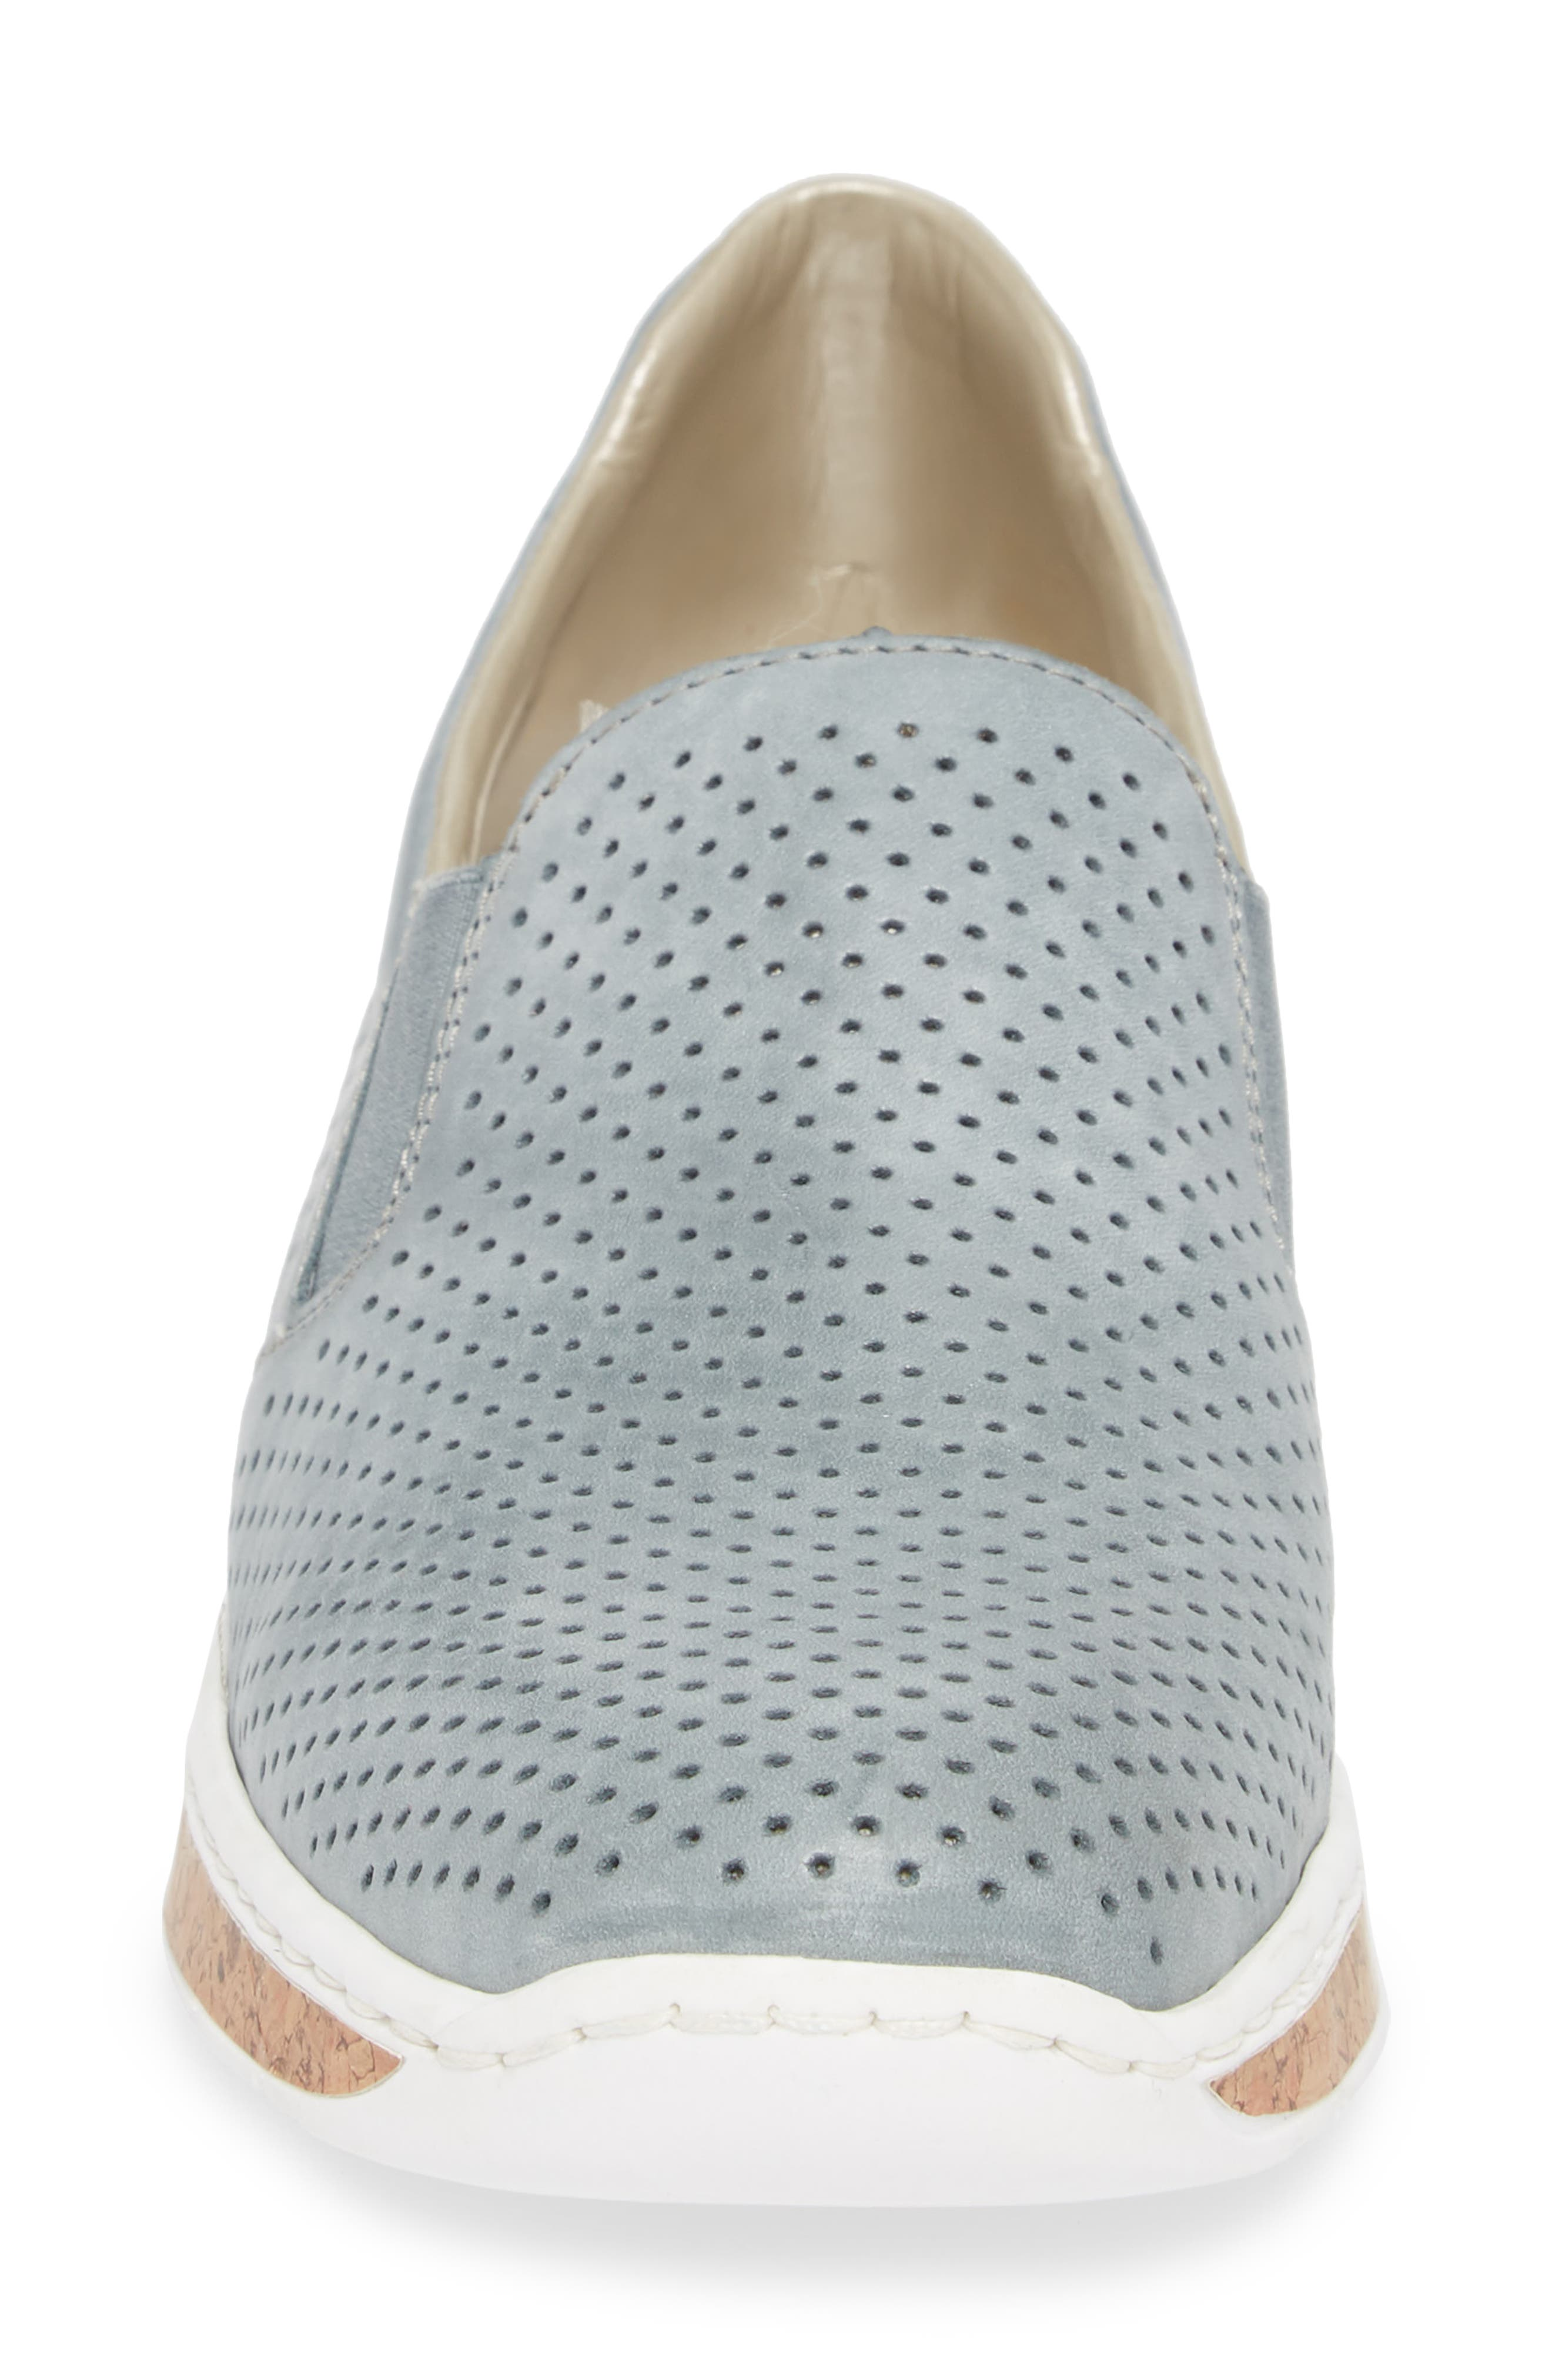 Doris 75 Wedge Sneaker,                             Alternate thumbnail 4, color,                             Royal Faux Leather